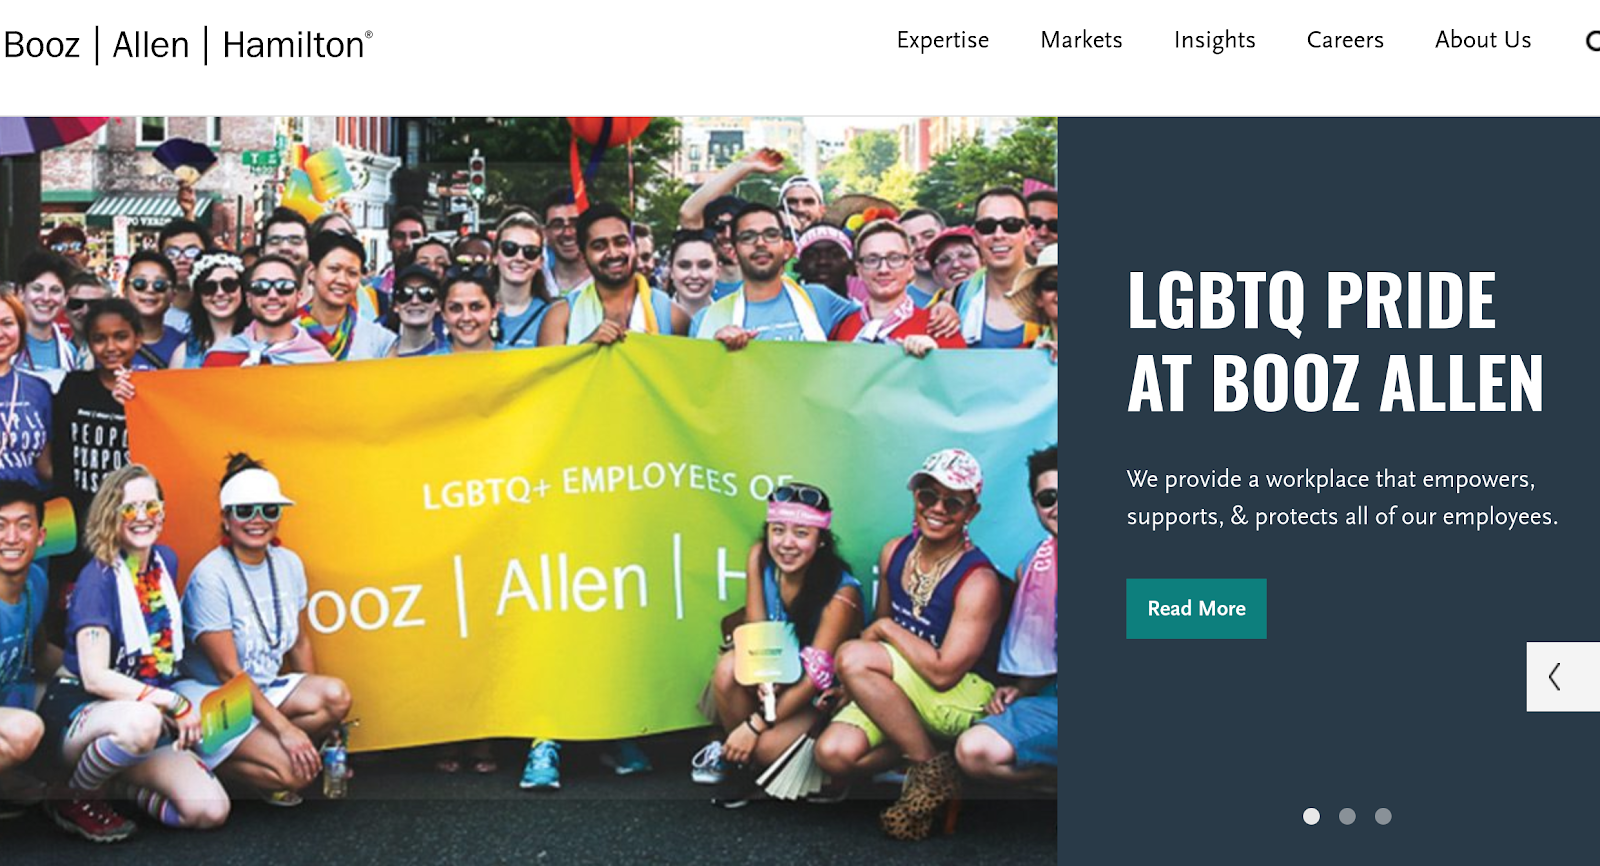 Booz_allen_hamilton_support_LGBTQ